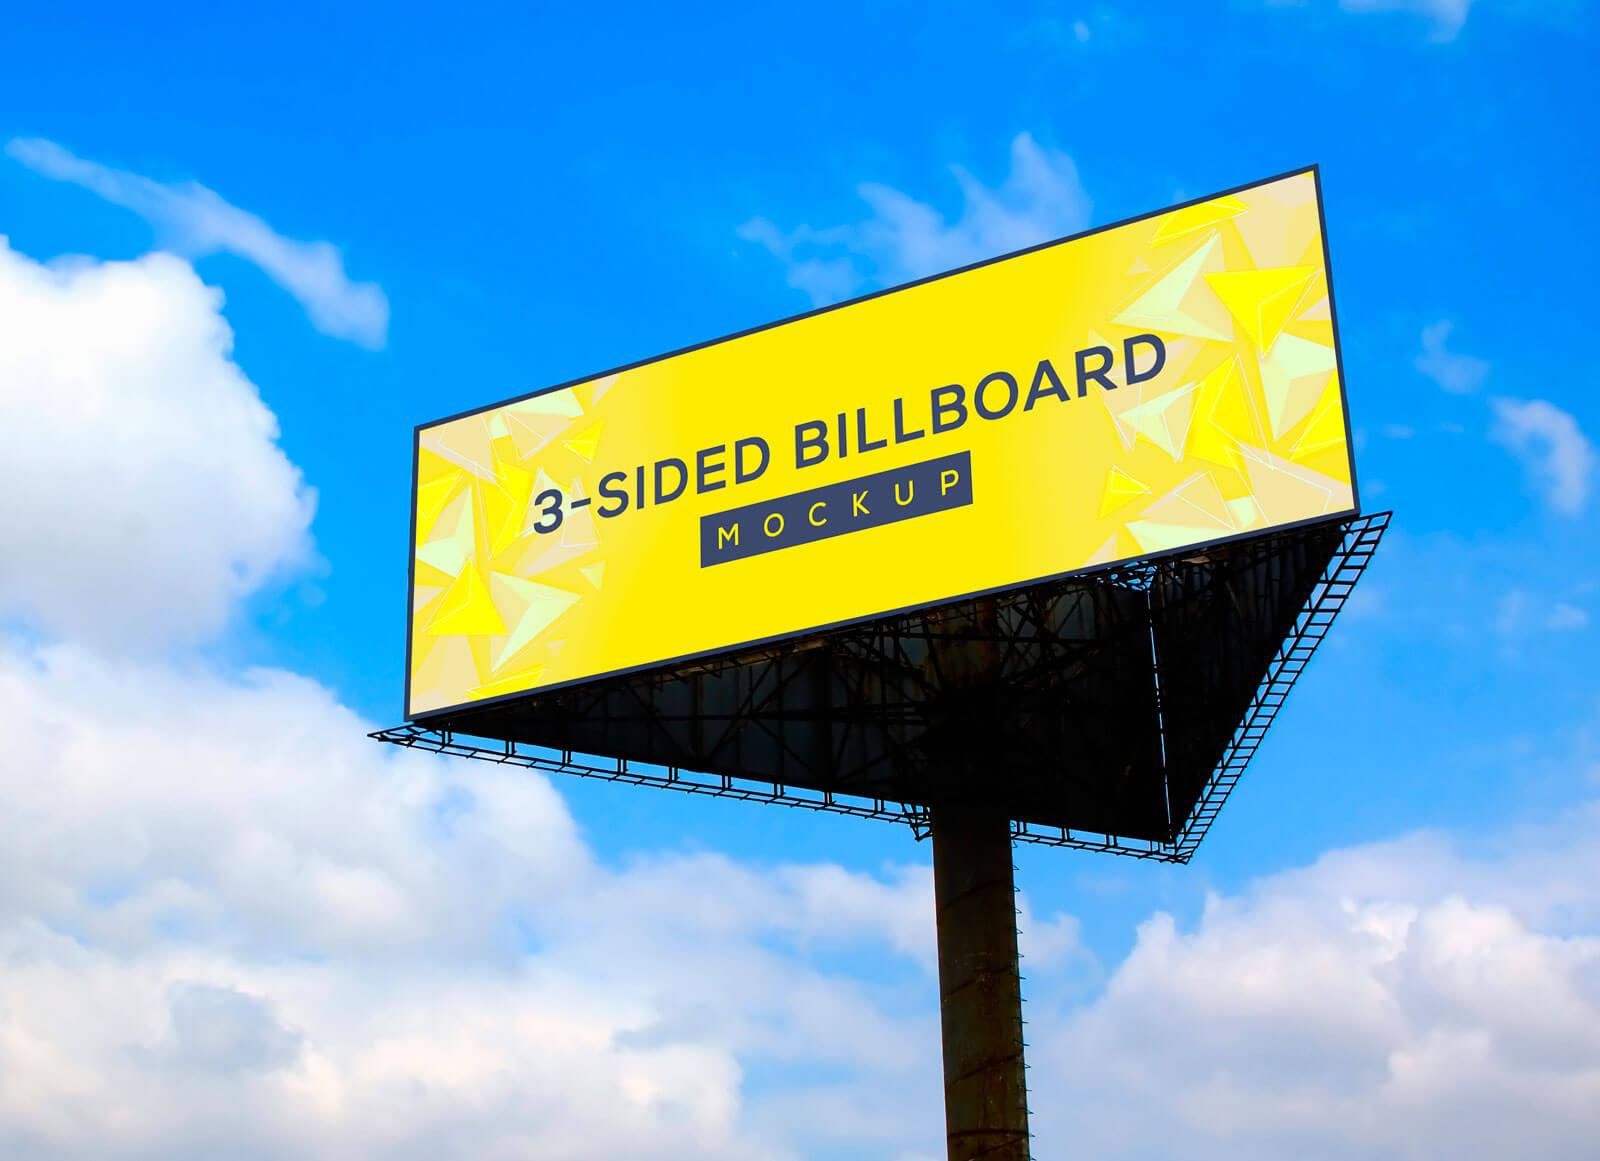 Free-Triangle-3-Sided-Unipole-Billboard-Mockup-PSD